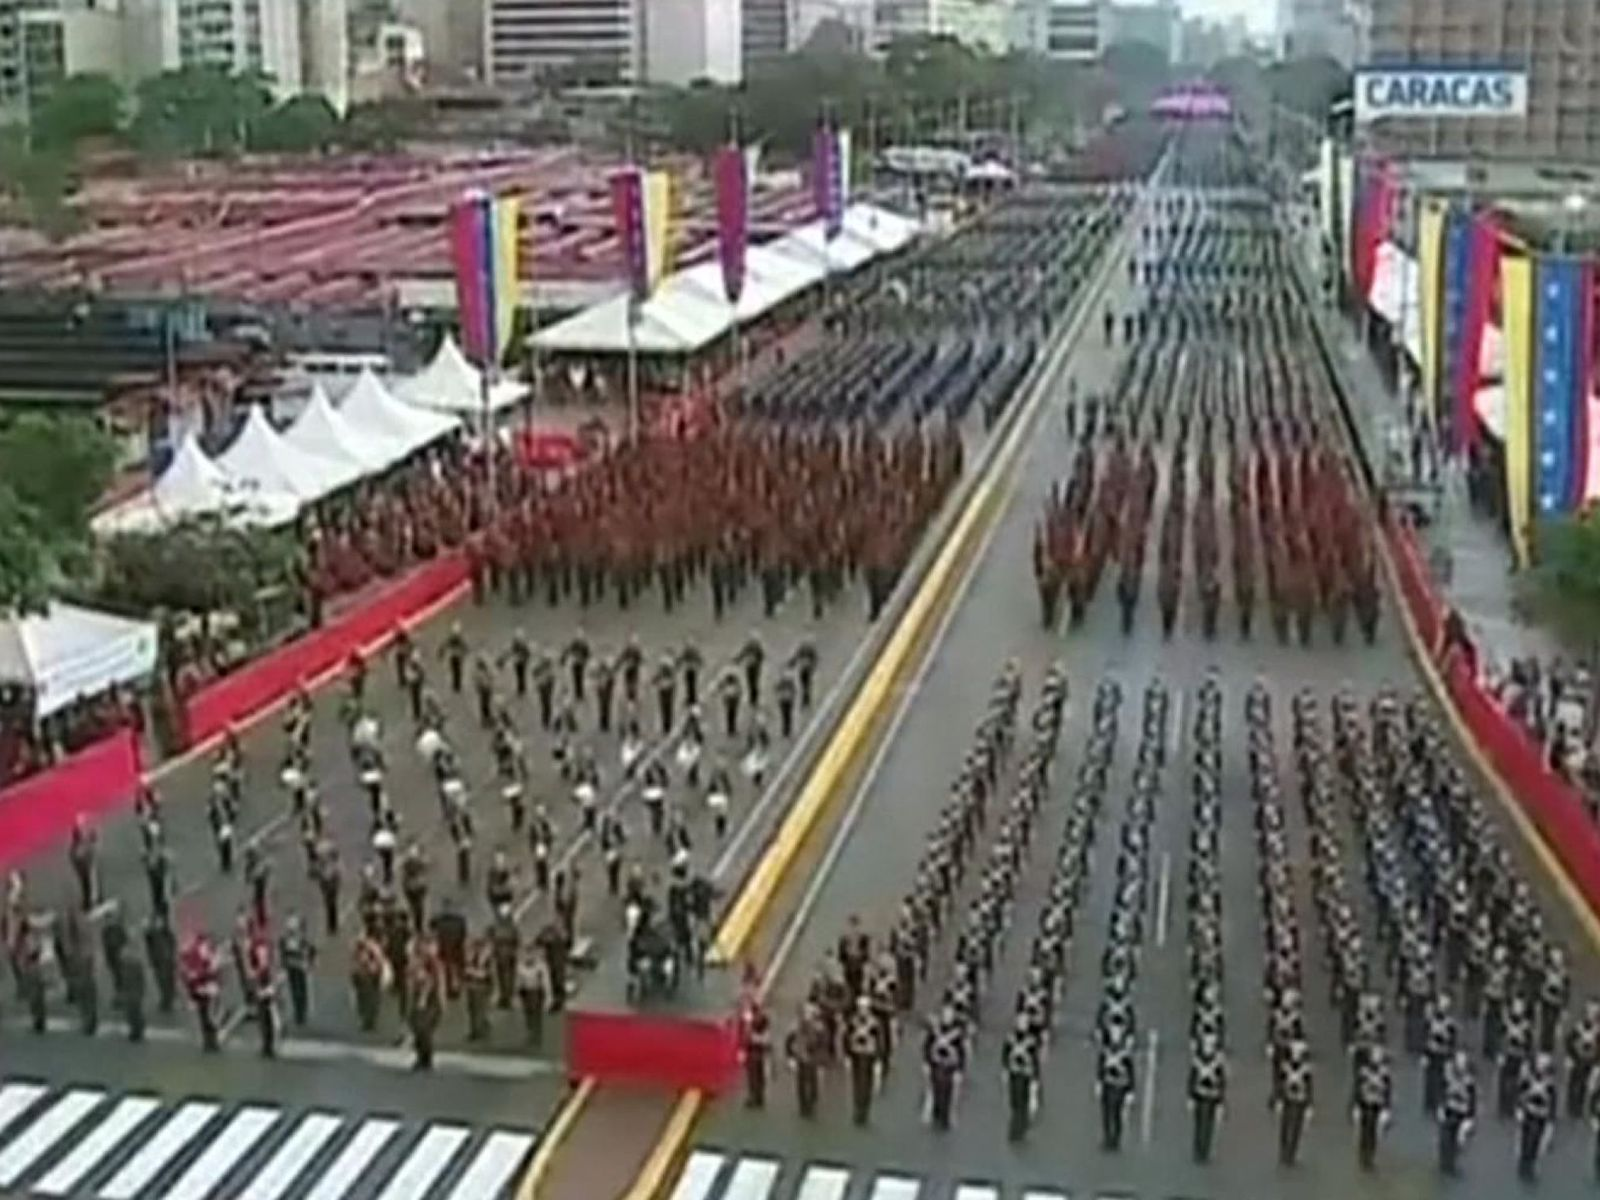 Drone attack targets Venezuelan President Nicolás Maduro in assassination attempt